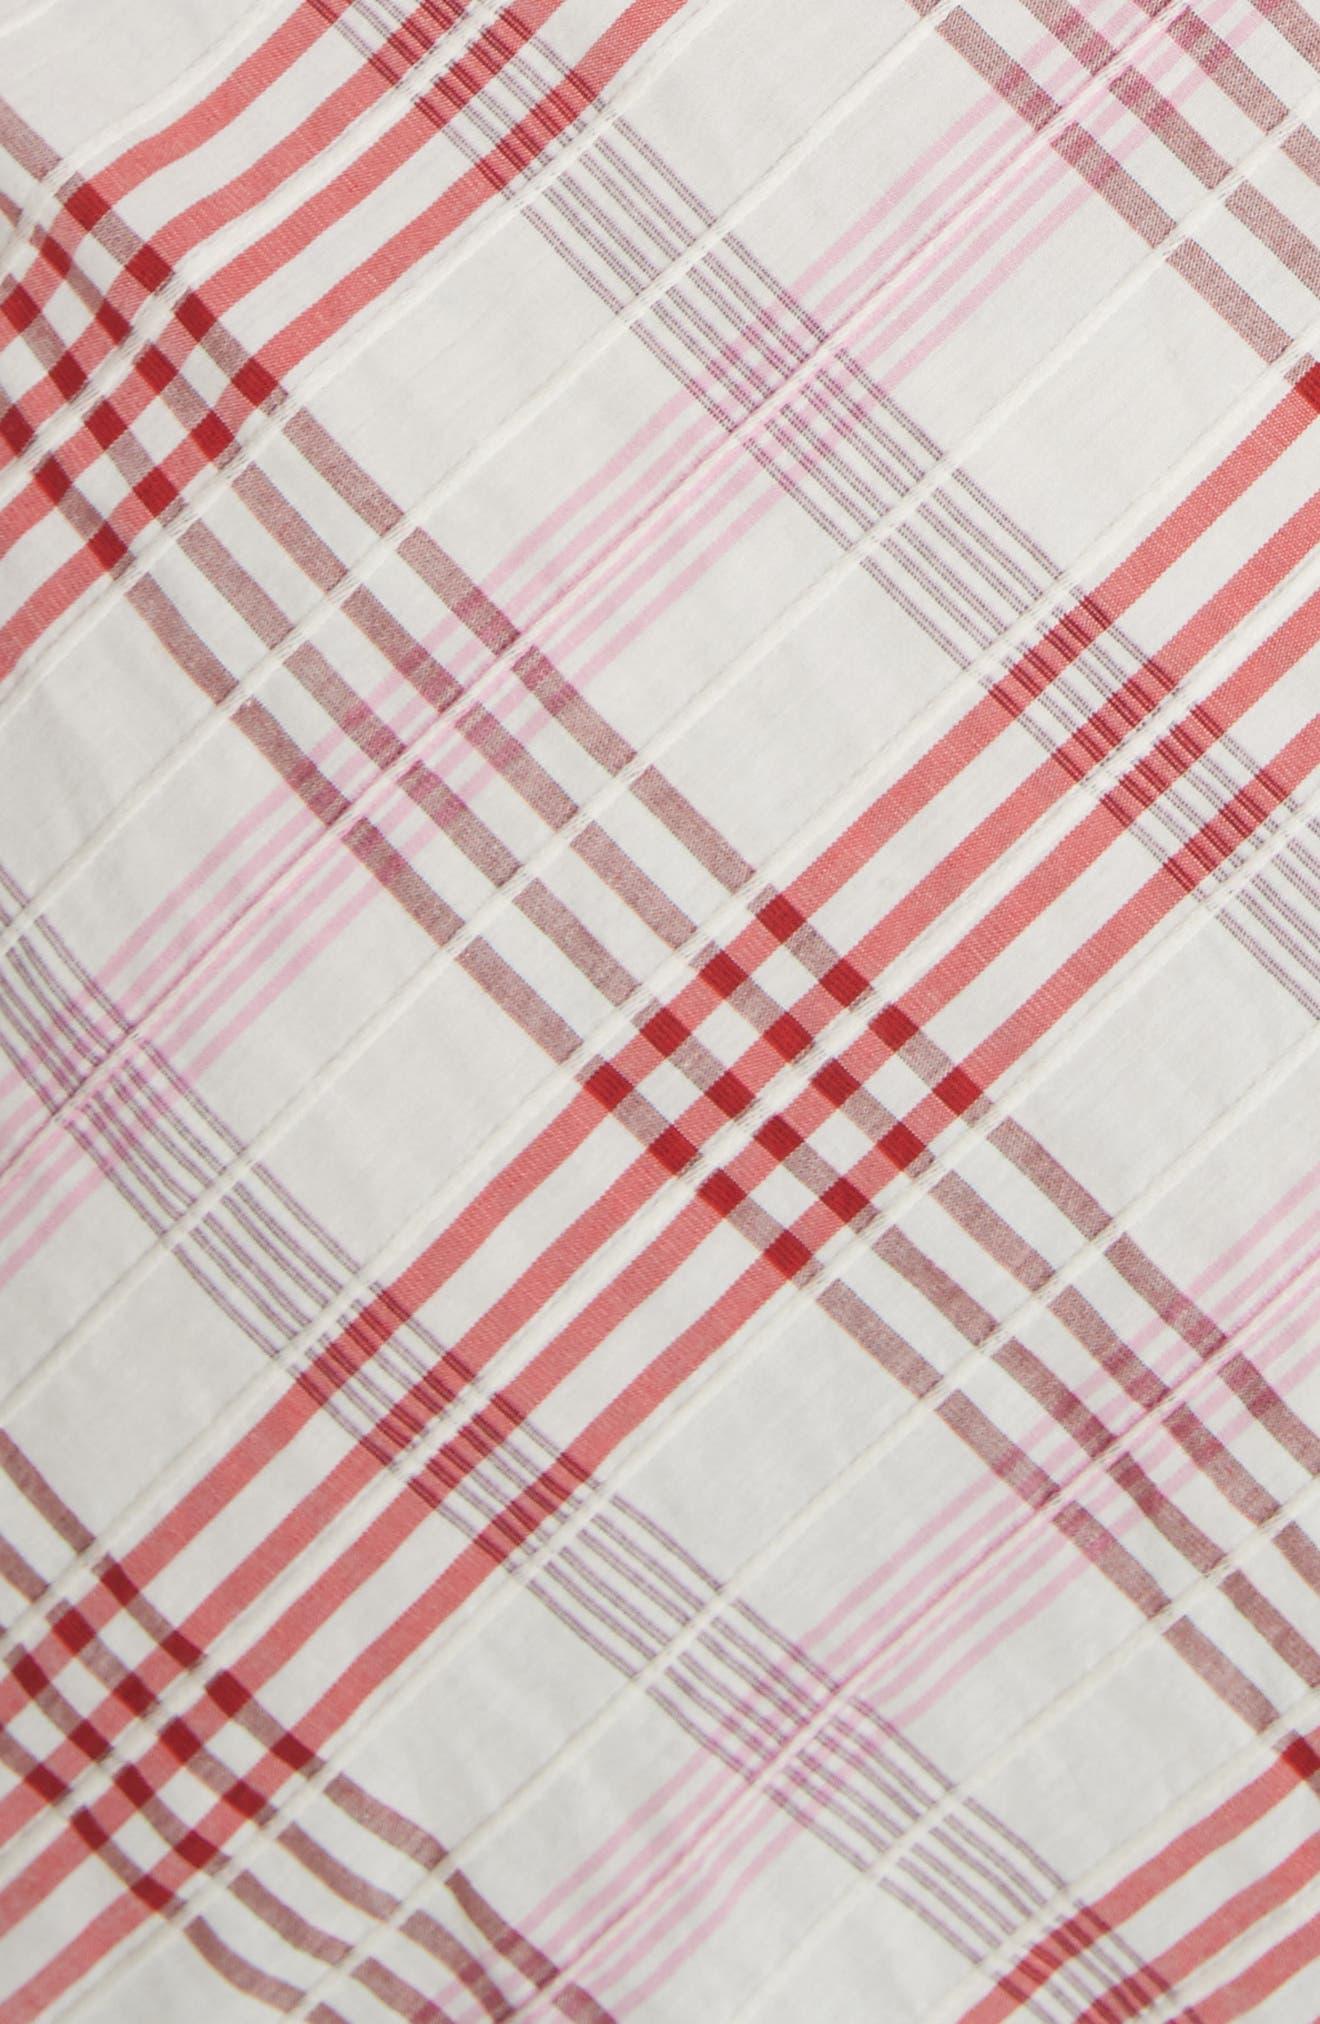 Della Gathered Plaid Dress,                             Alternate thumbnail 5, color,                             Pink